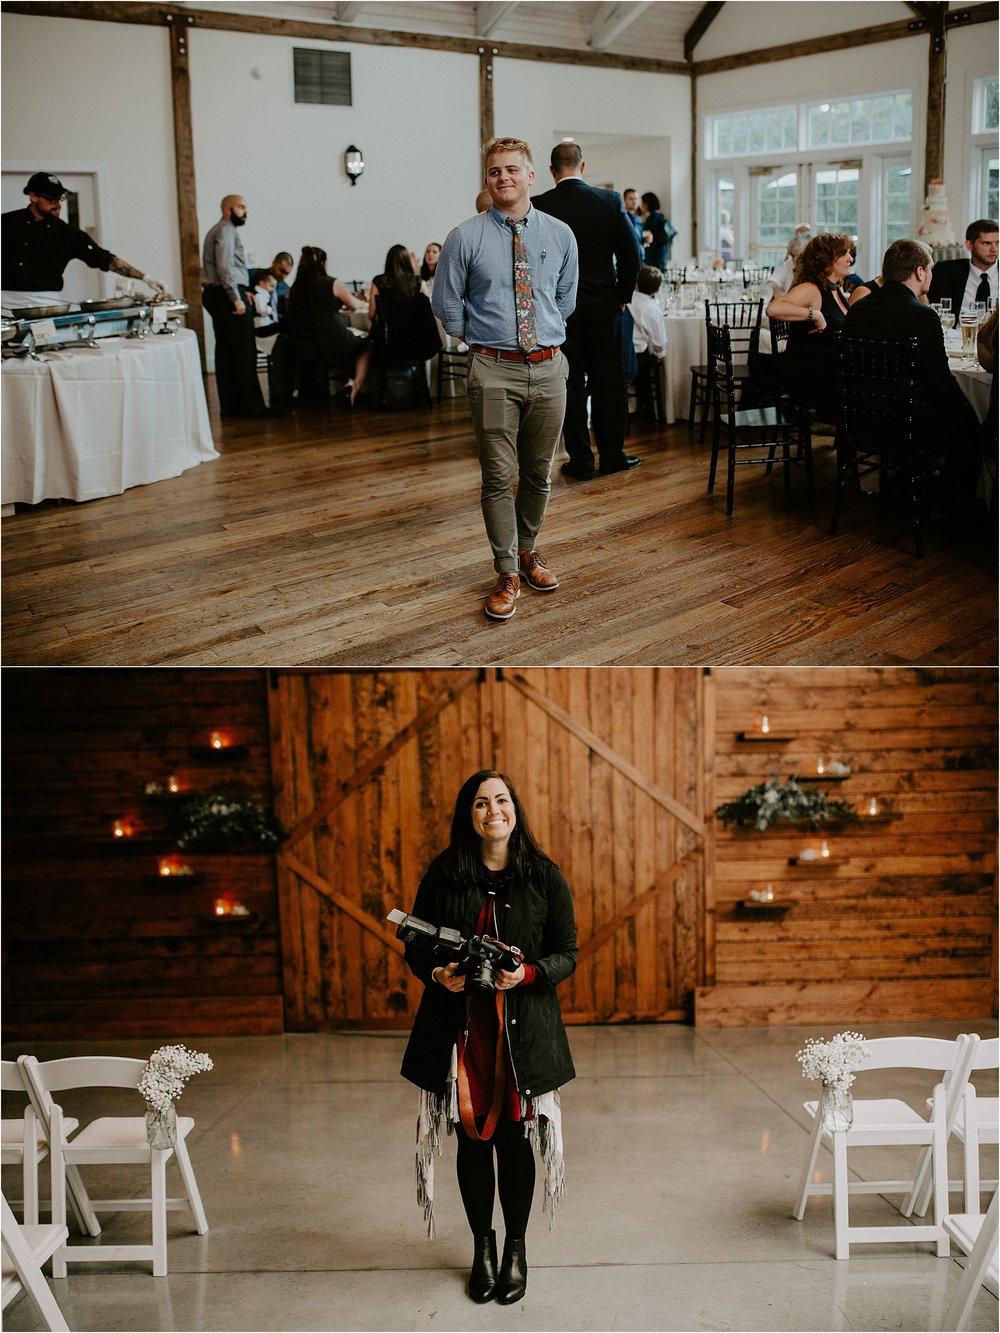 Sarah_Brookhart_PA_MD_Wedding_Photographer_0009.jpg